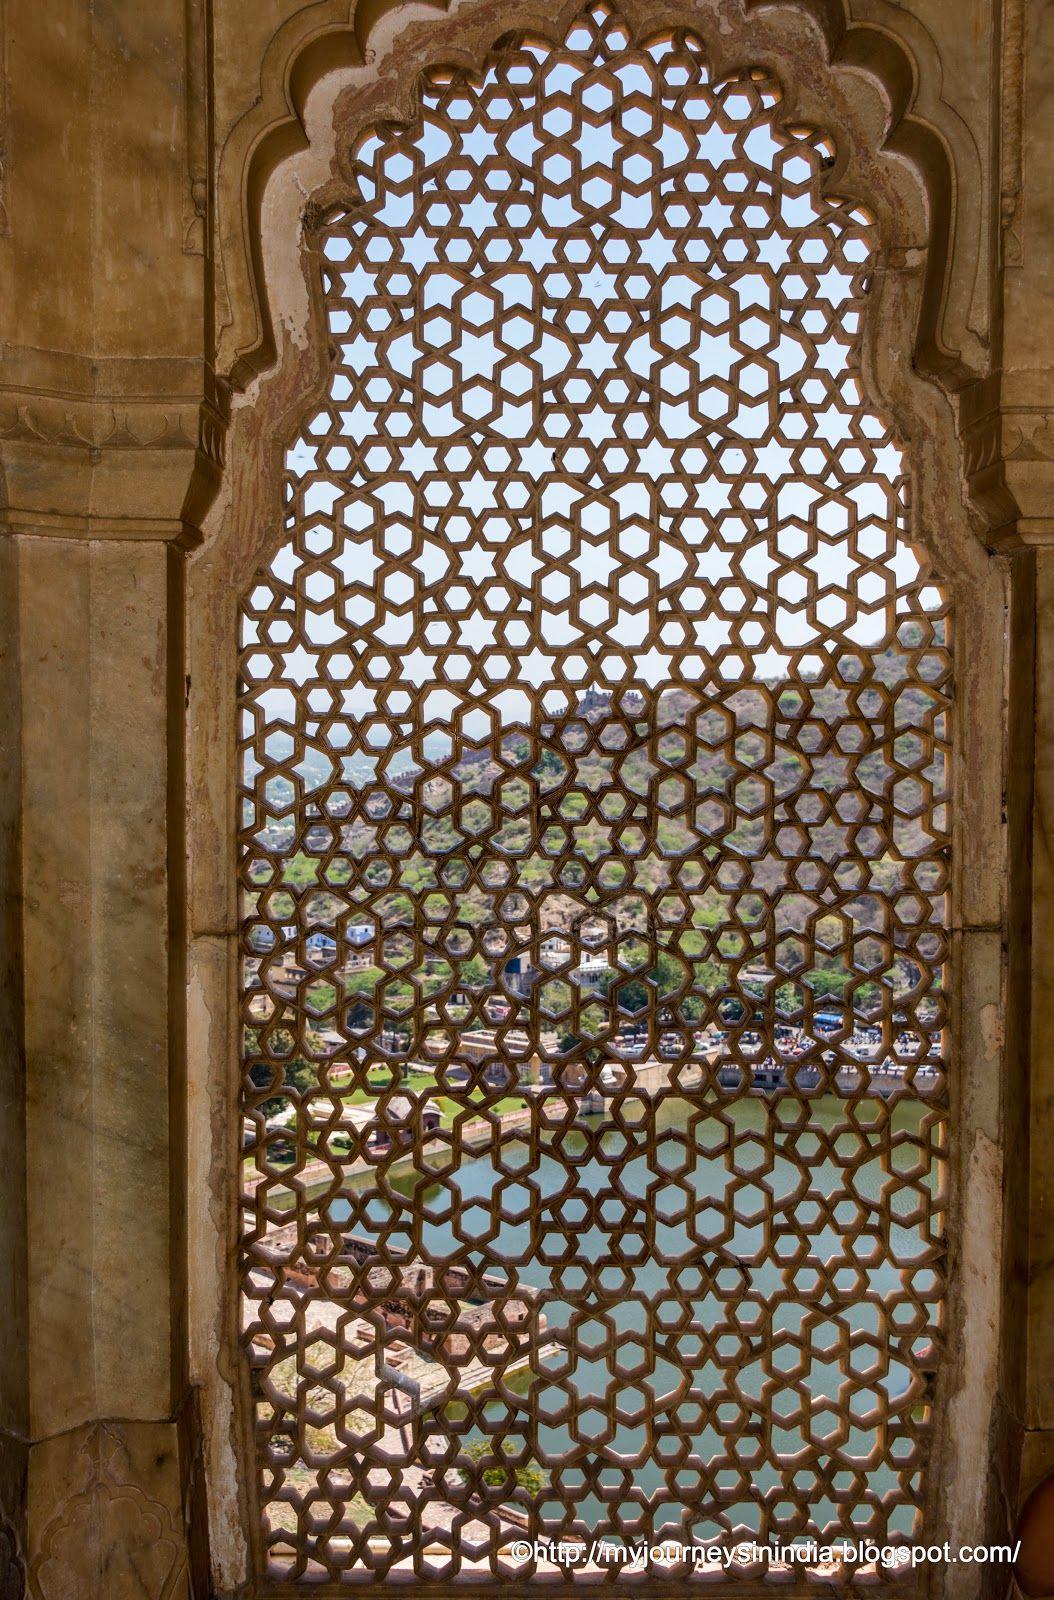 Latticed Windows in Amer Fort Jaipur